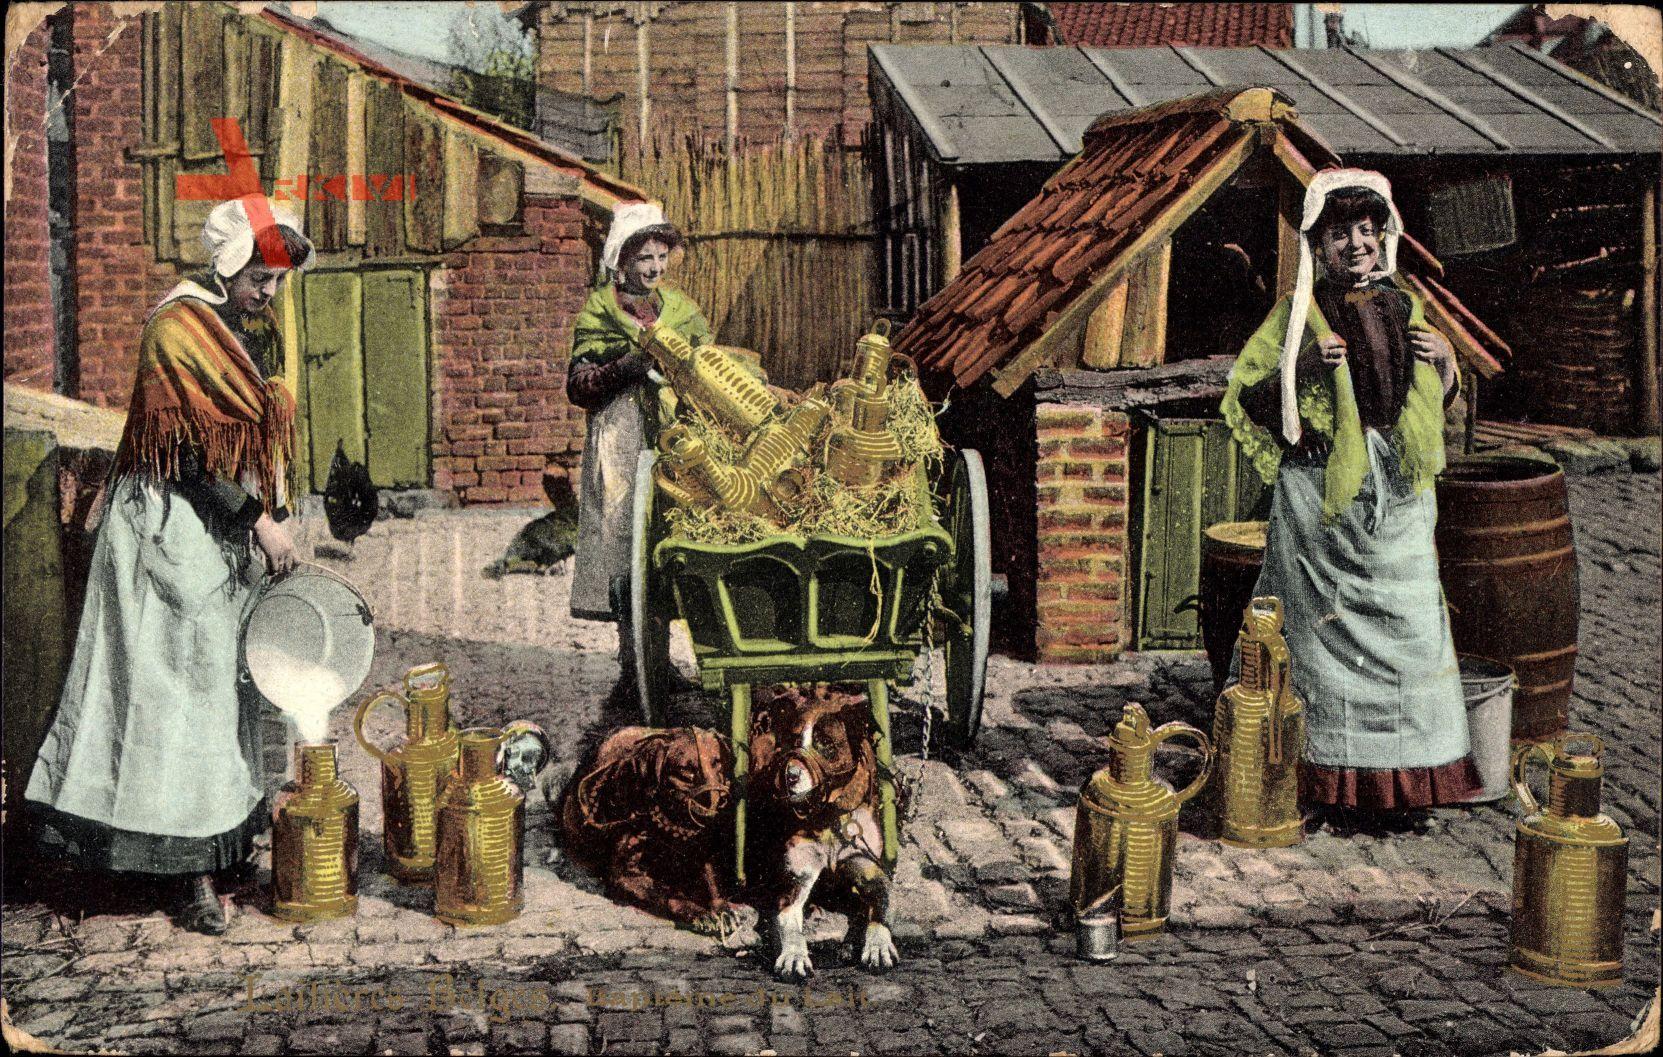 Laitieres Belges, Bapteme du Lait, Hundekarren, Milchfrauen in Tracht